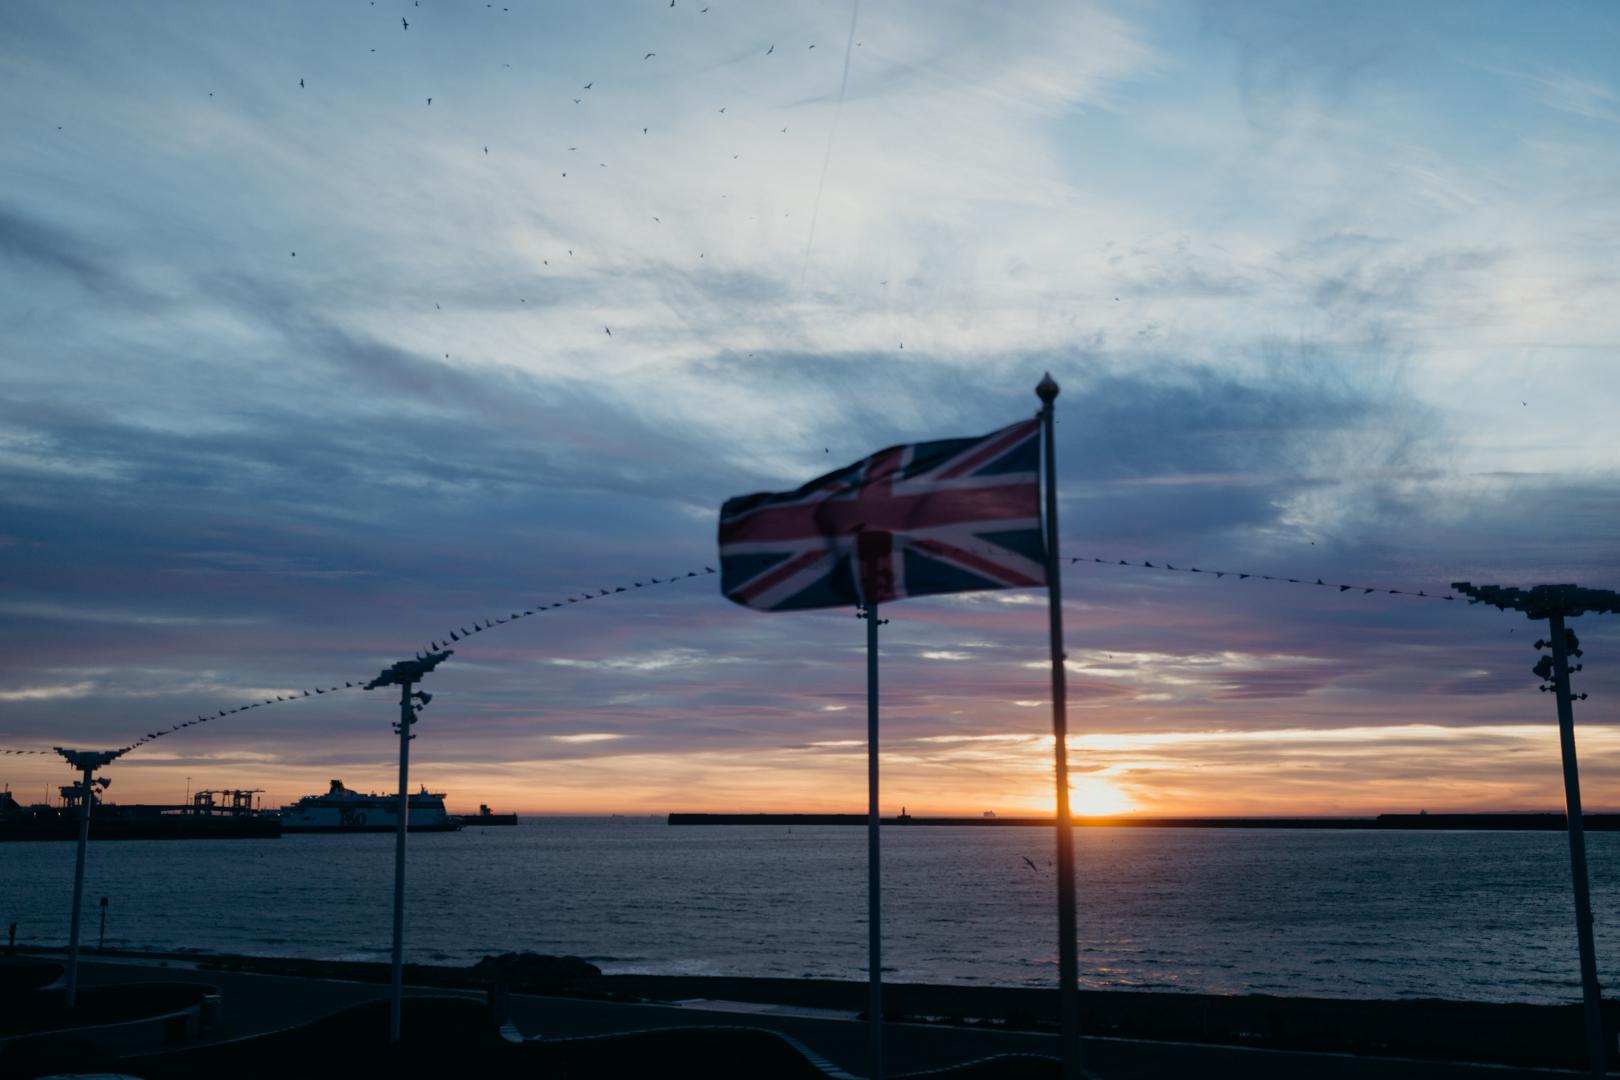 20151030_England_LondonCityGuide_32.jpg